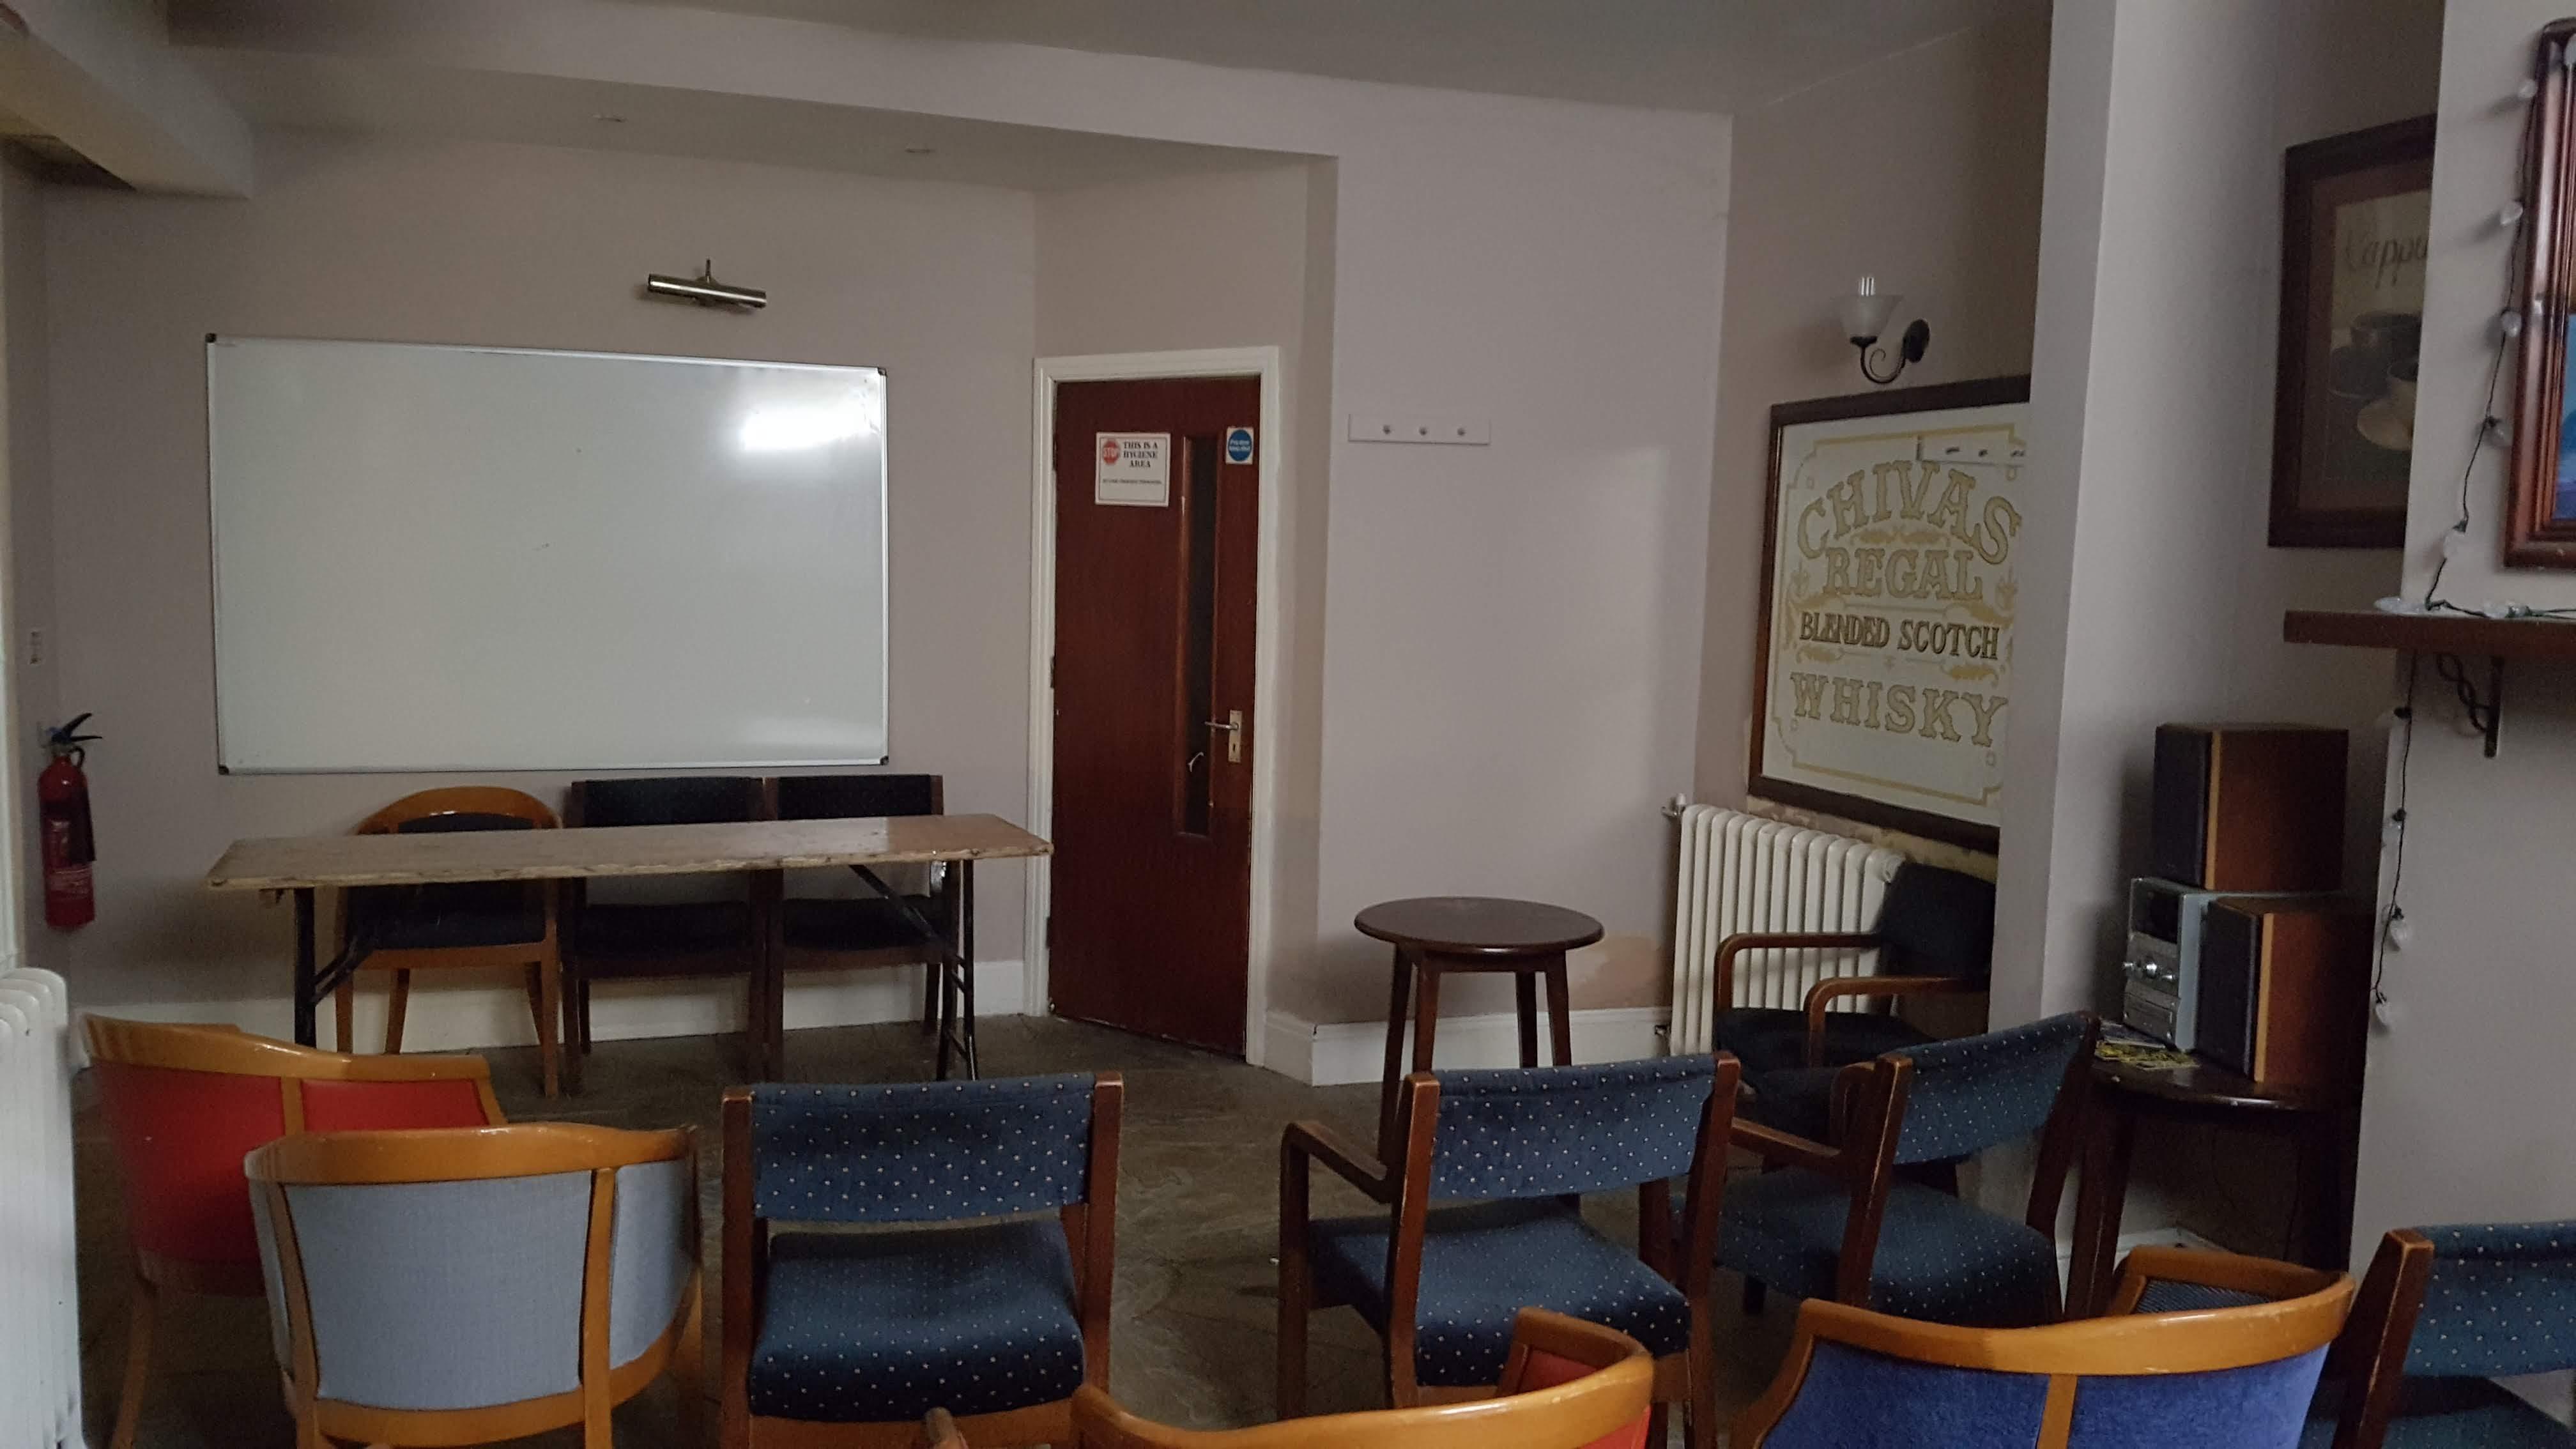 The Casa, Venue hire break out room in lower venue